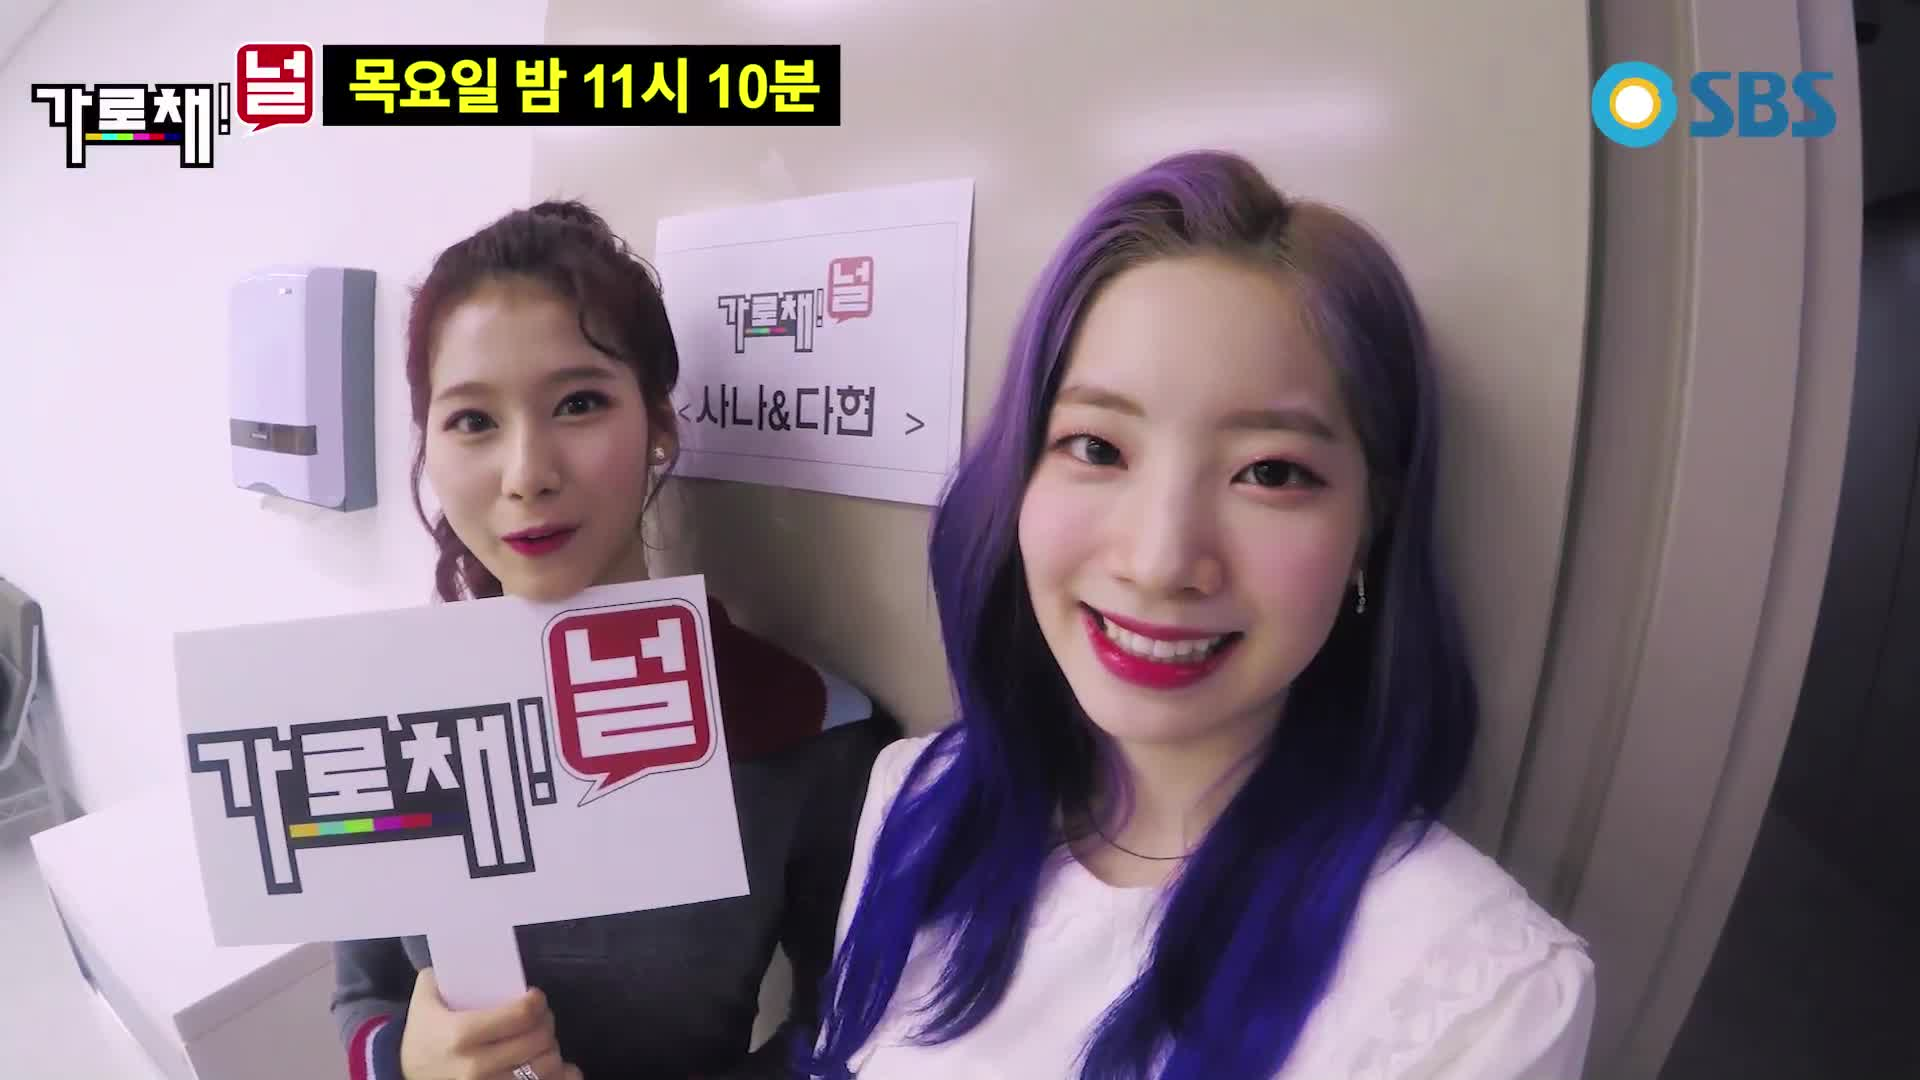 SBS [가로채널] 트와이스 사나X다현 대기실 셀프캠 (TWICE SanaXDahyun)